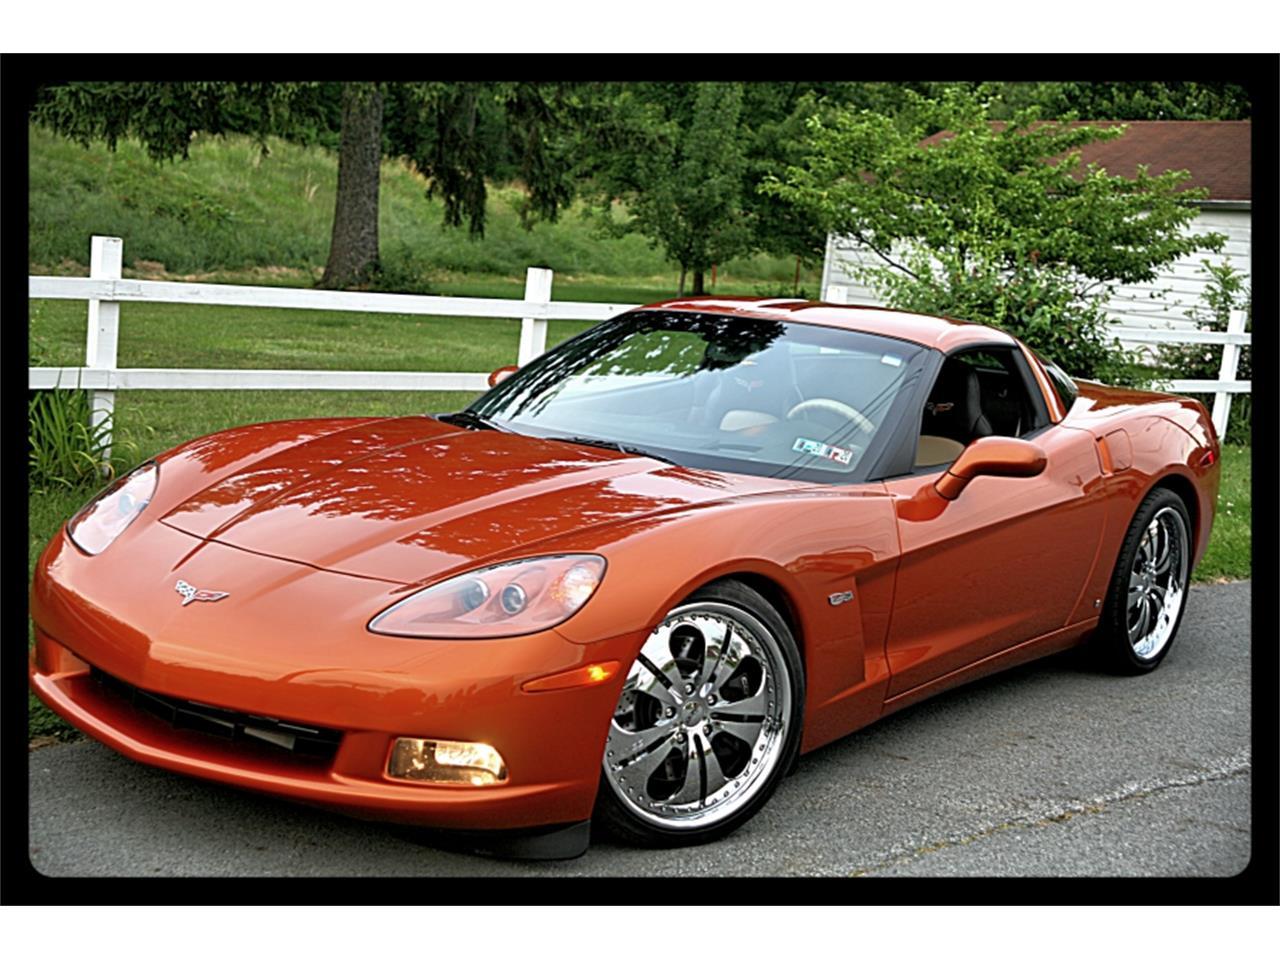 2007 Chevrolet Corvette (CC-1236824) for sale in OLD FORGE, Pennsylvania